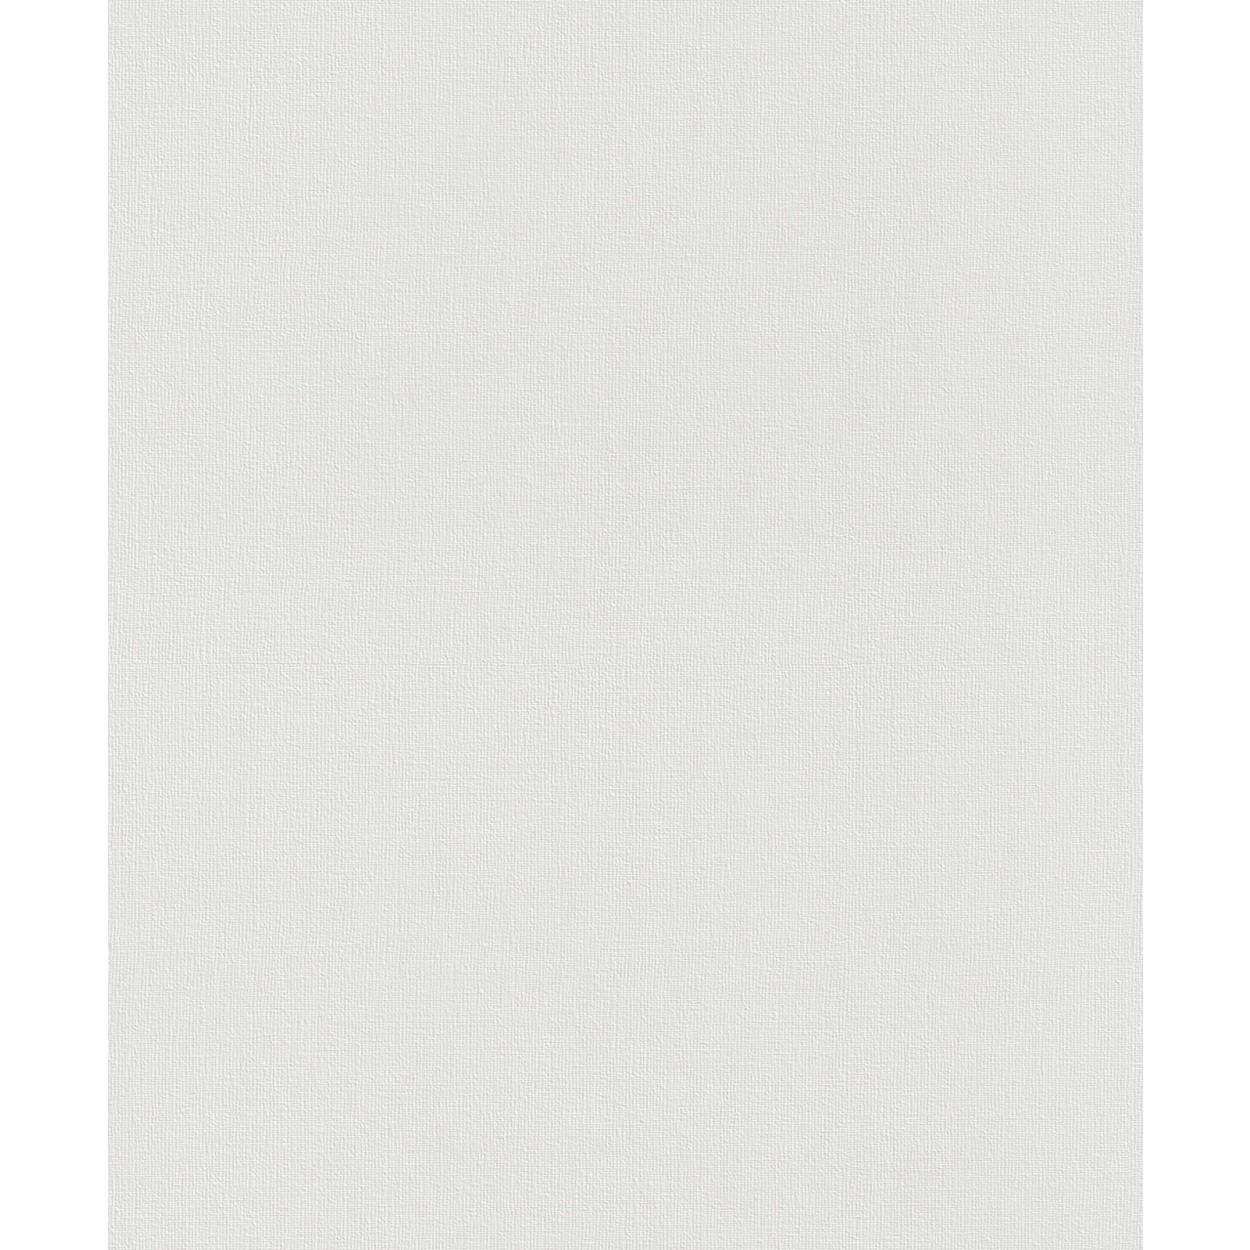 Full Size of Tapeten 2020 Wohnzimmer Tapete 161403 Rasch Wallton Jetzt Vliestapete Entdecken Led Deckenleuchte Decken Tischlampe Wandtattoo Lampen Kommode Lampe Wohnzimmer Tapeten 2020 Wohnzimmer